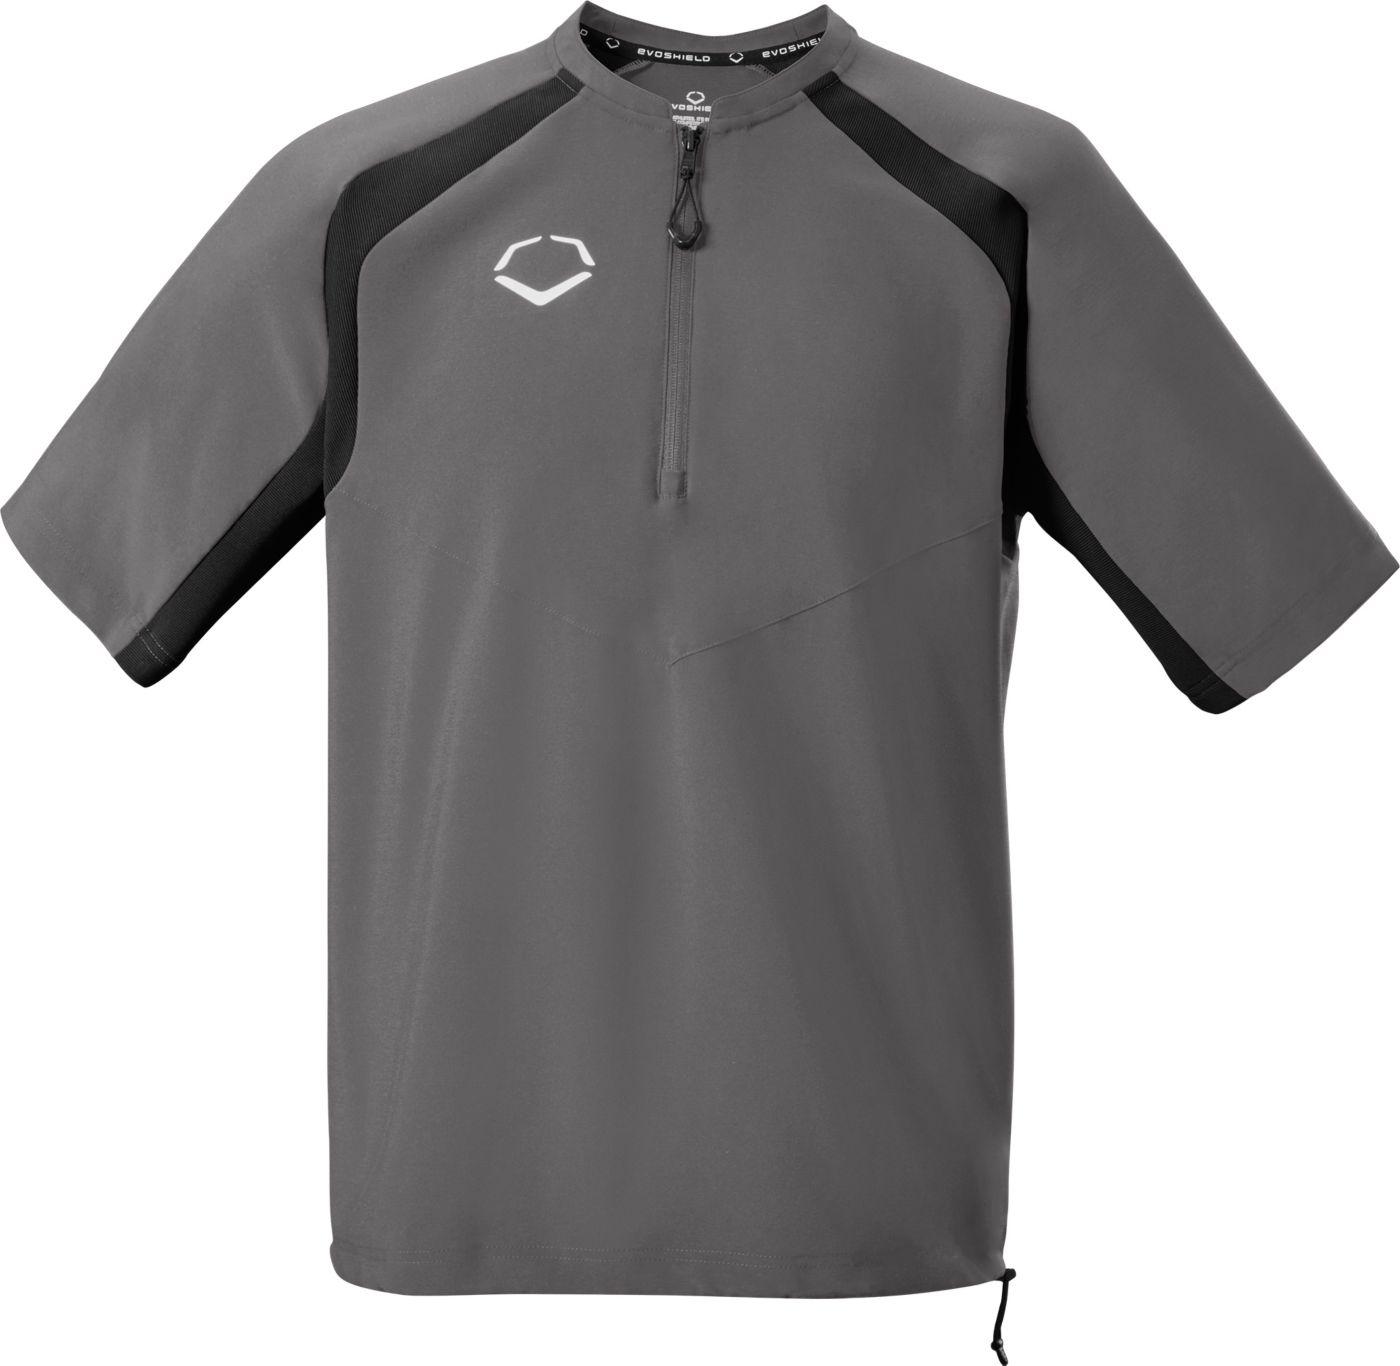 EvoShield Men's Pro Team BP Jacket